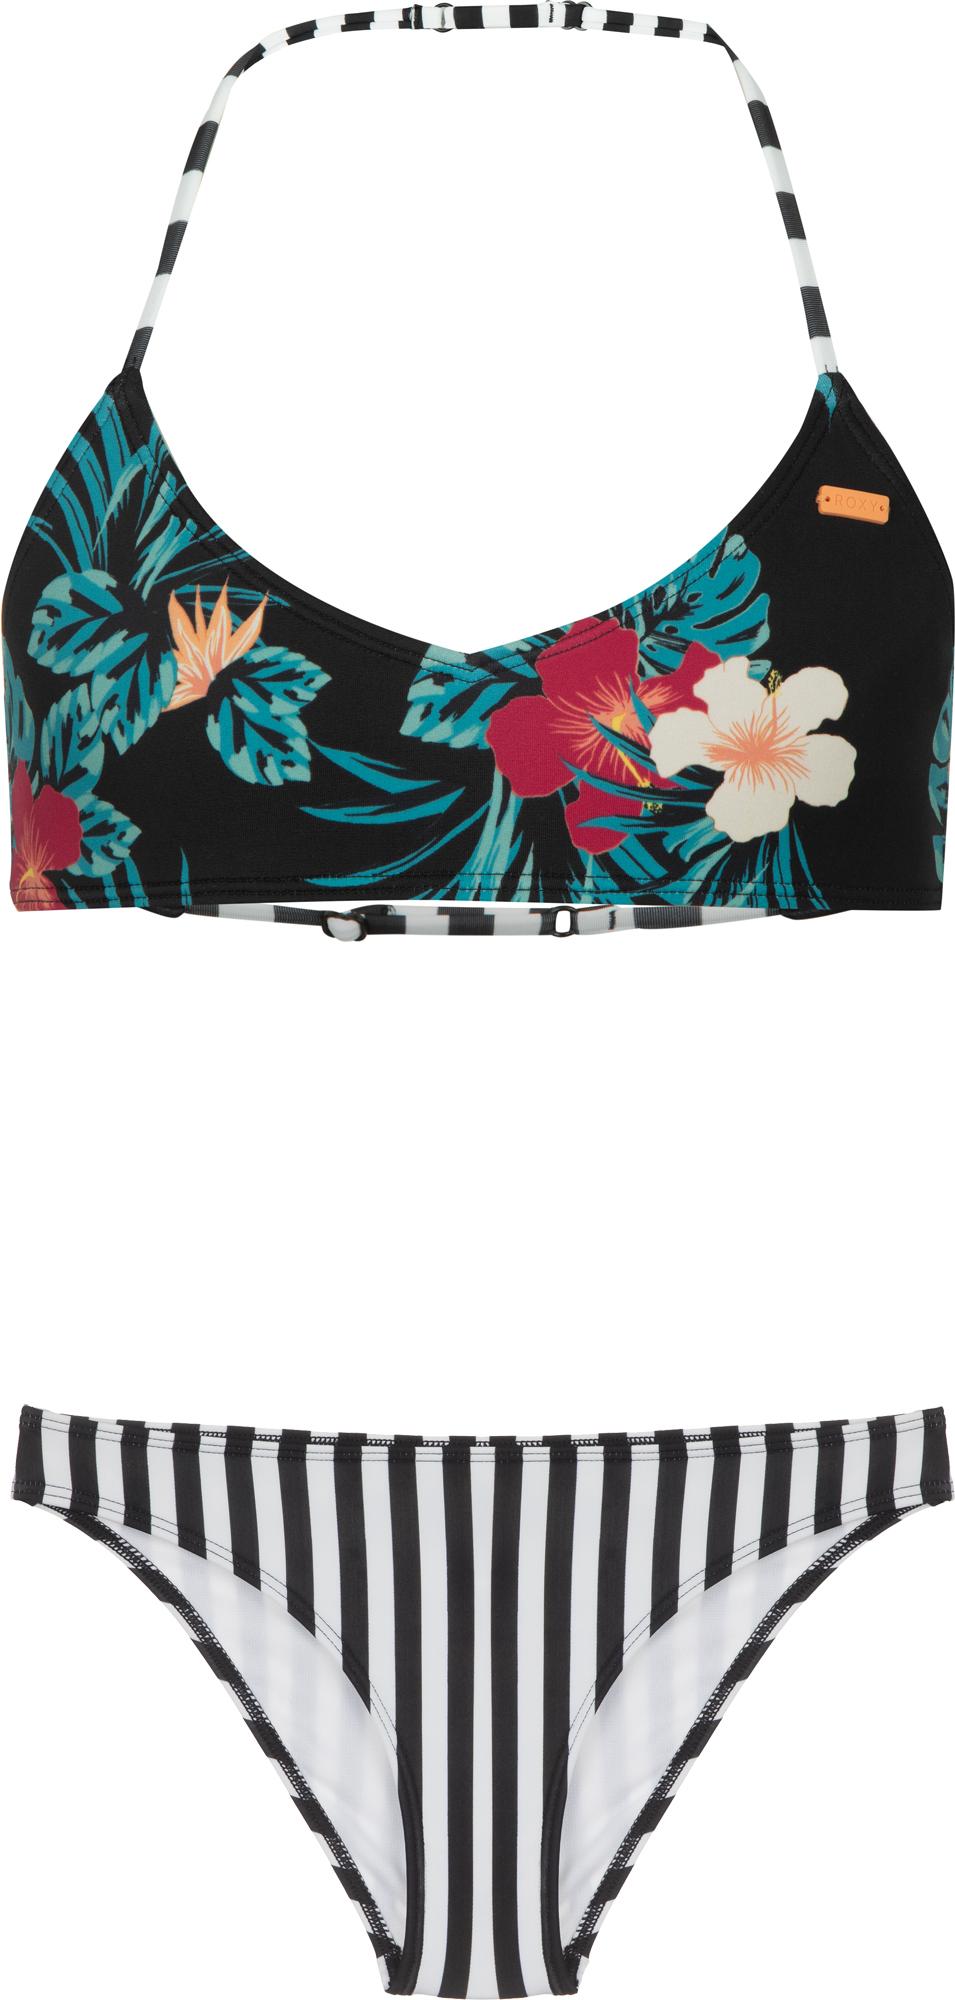 Roxy Бикини для девочек Roxy Sunkissed, размер 146-152